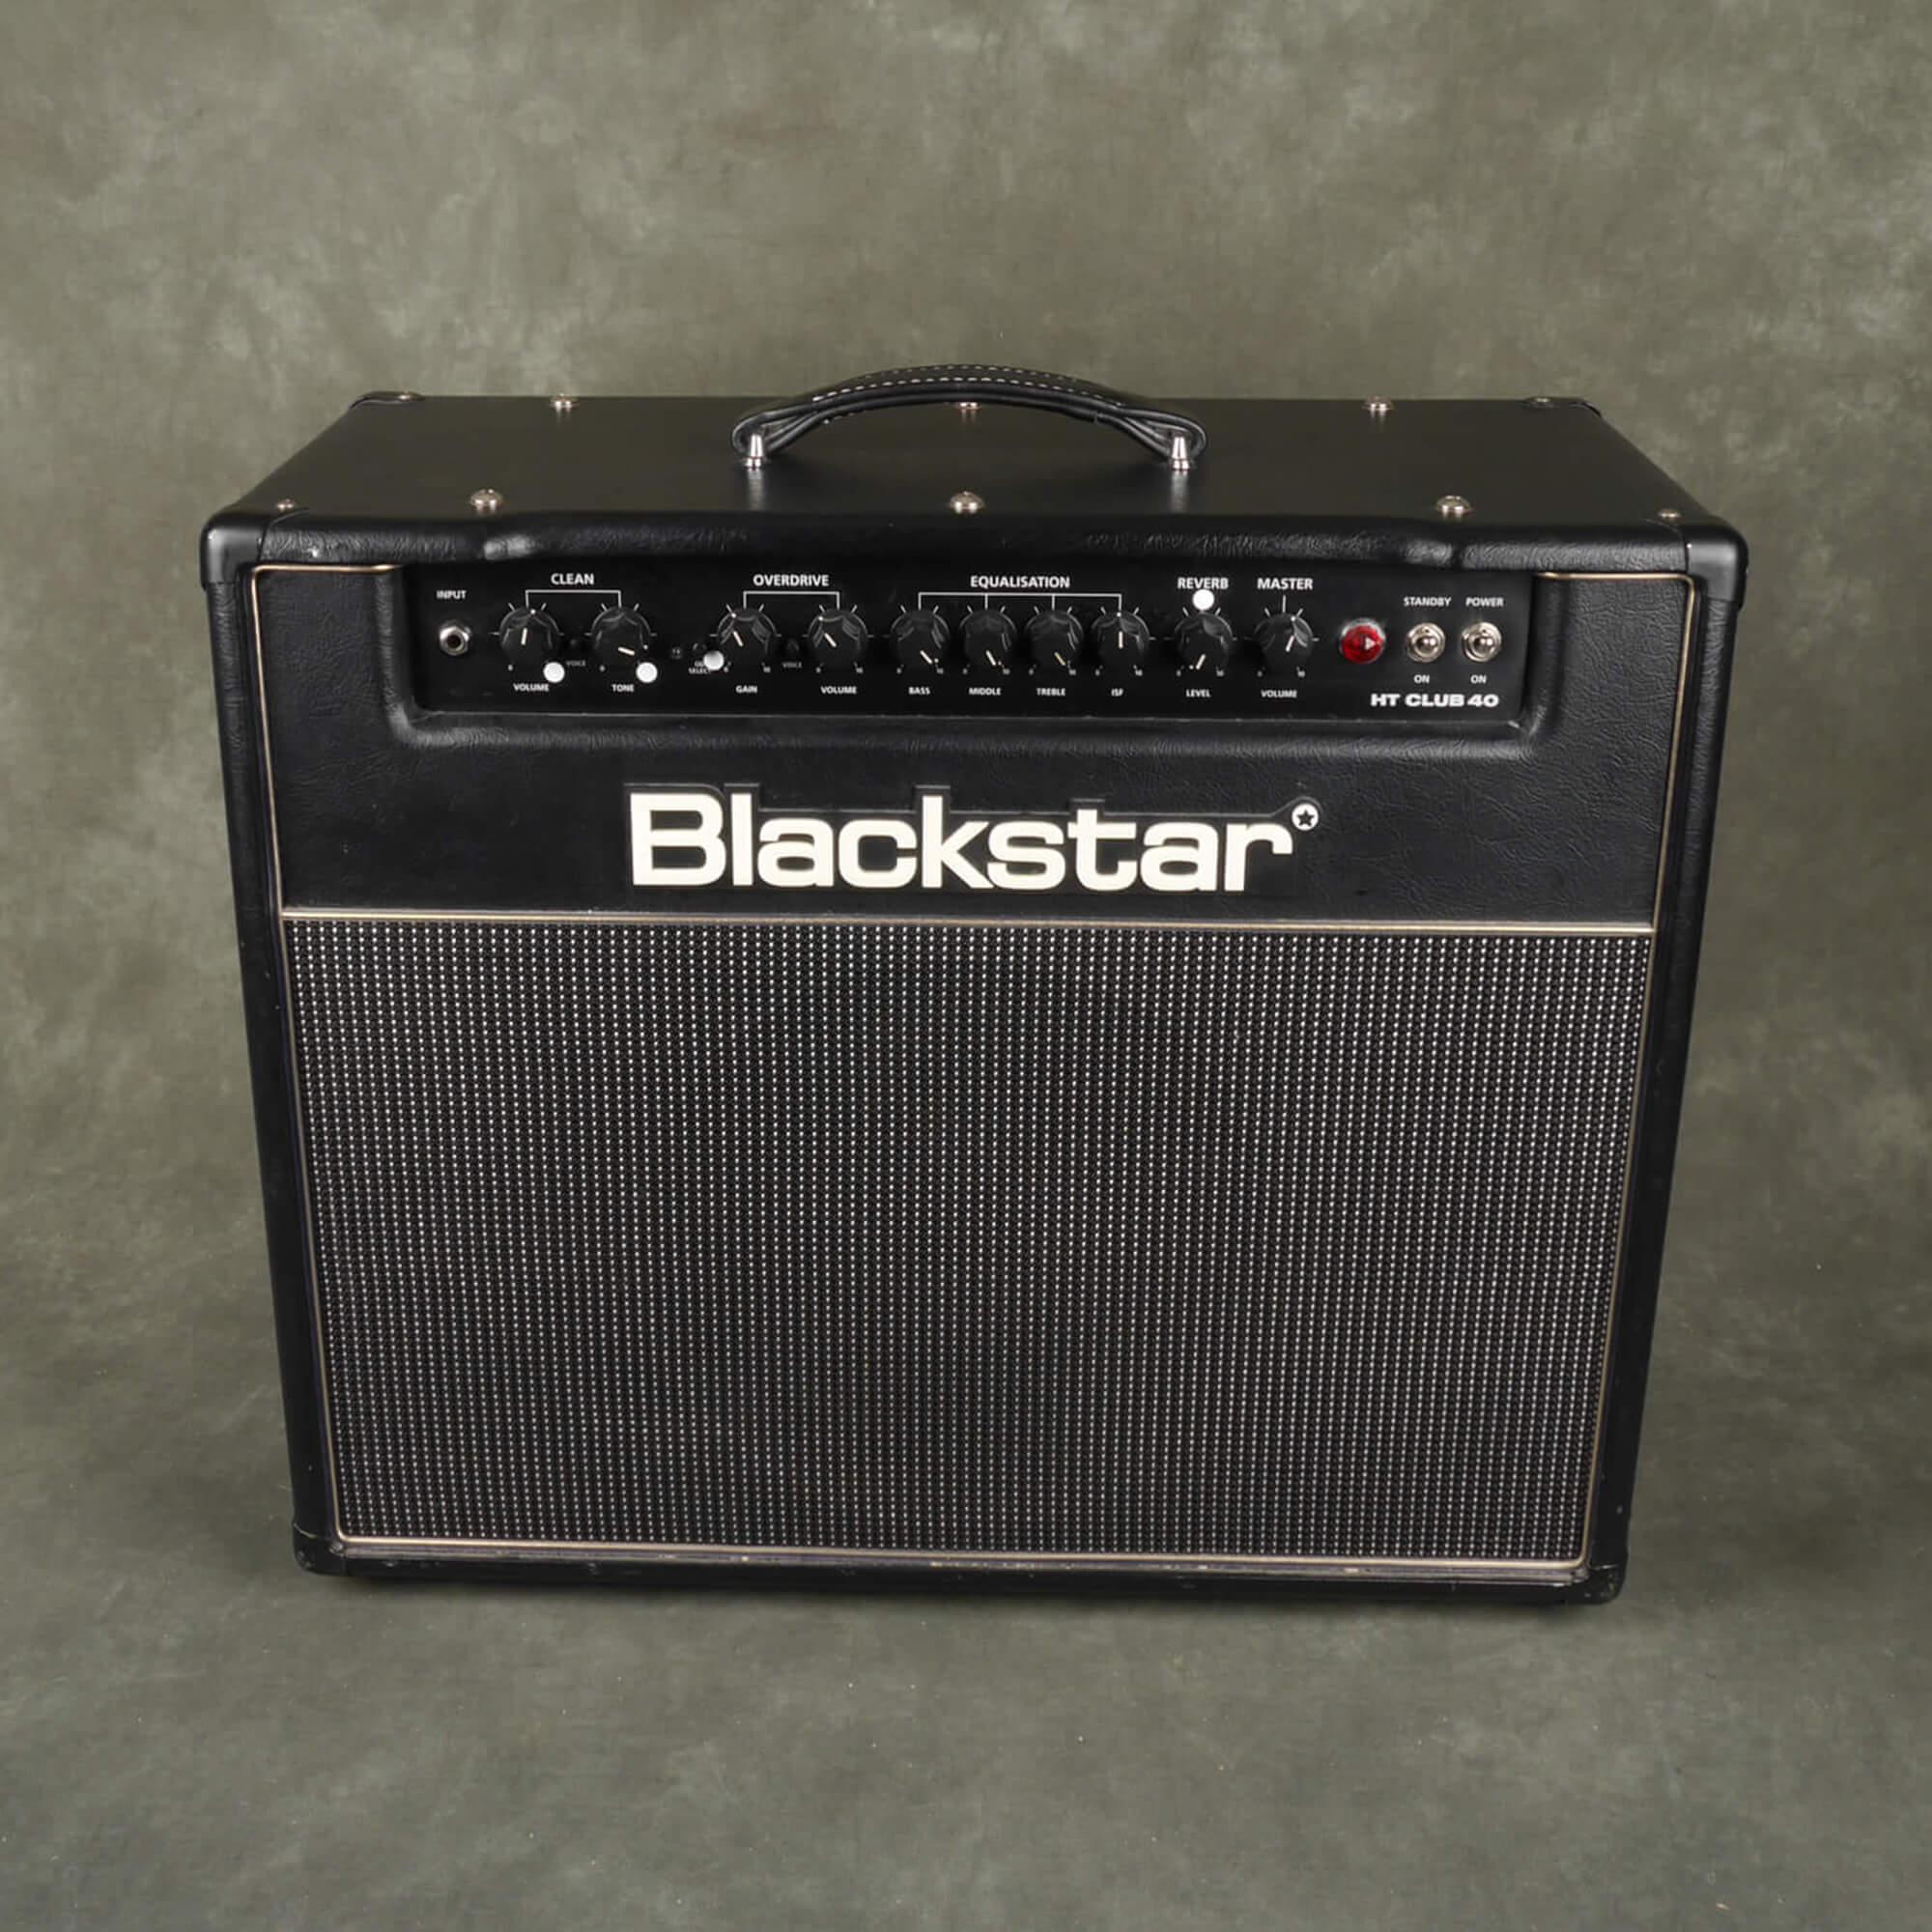 Blackstar HT Club 40 Guitar Amplifier - 2nd Hand **UK SHIPPING ONLY**